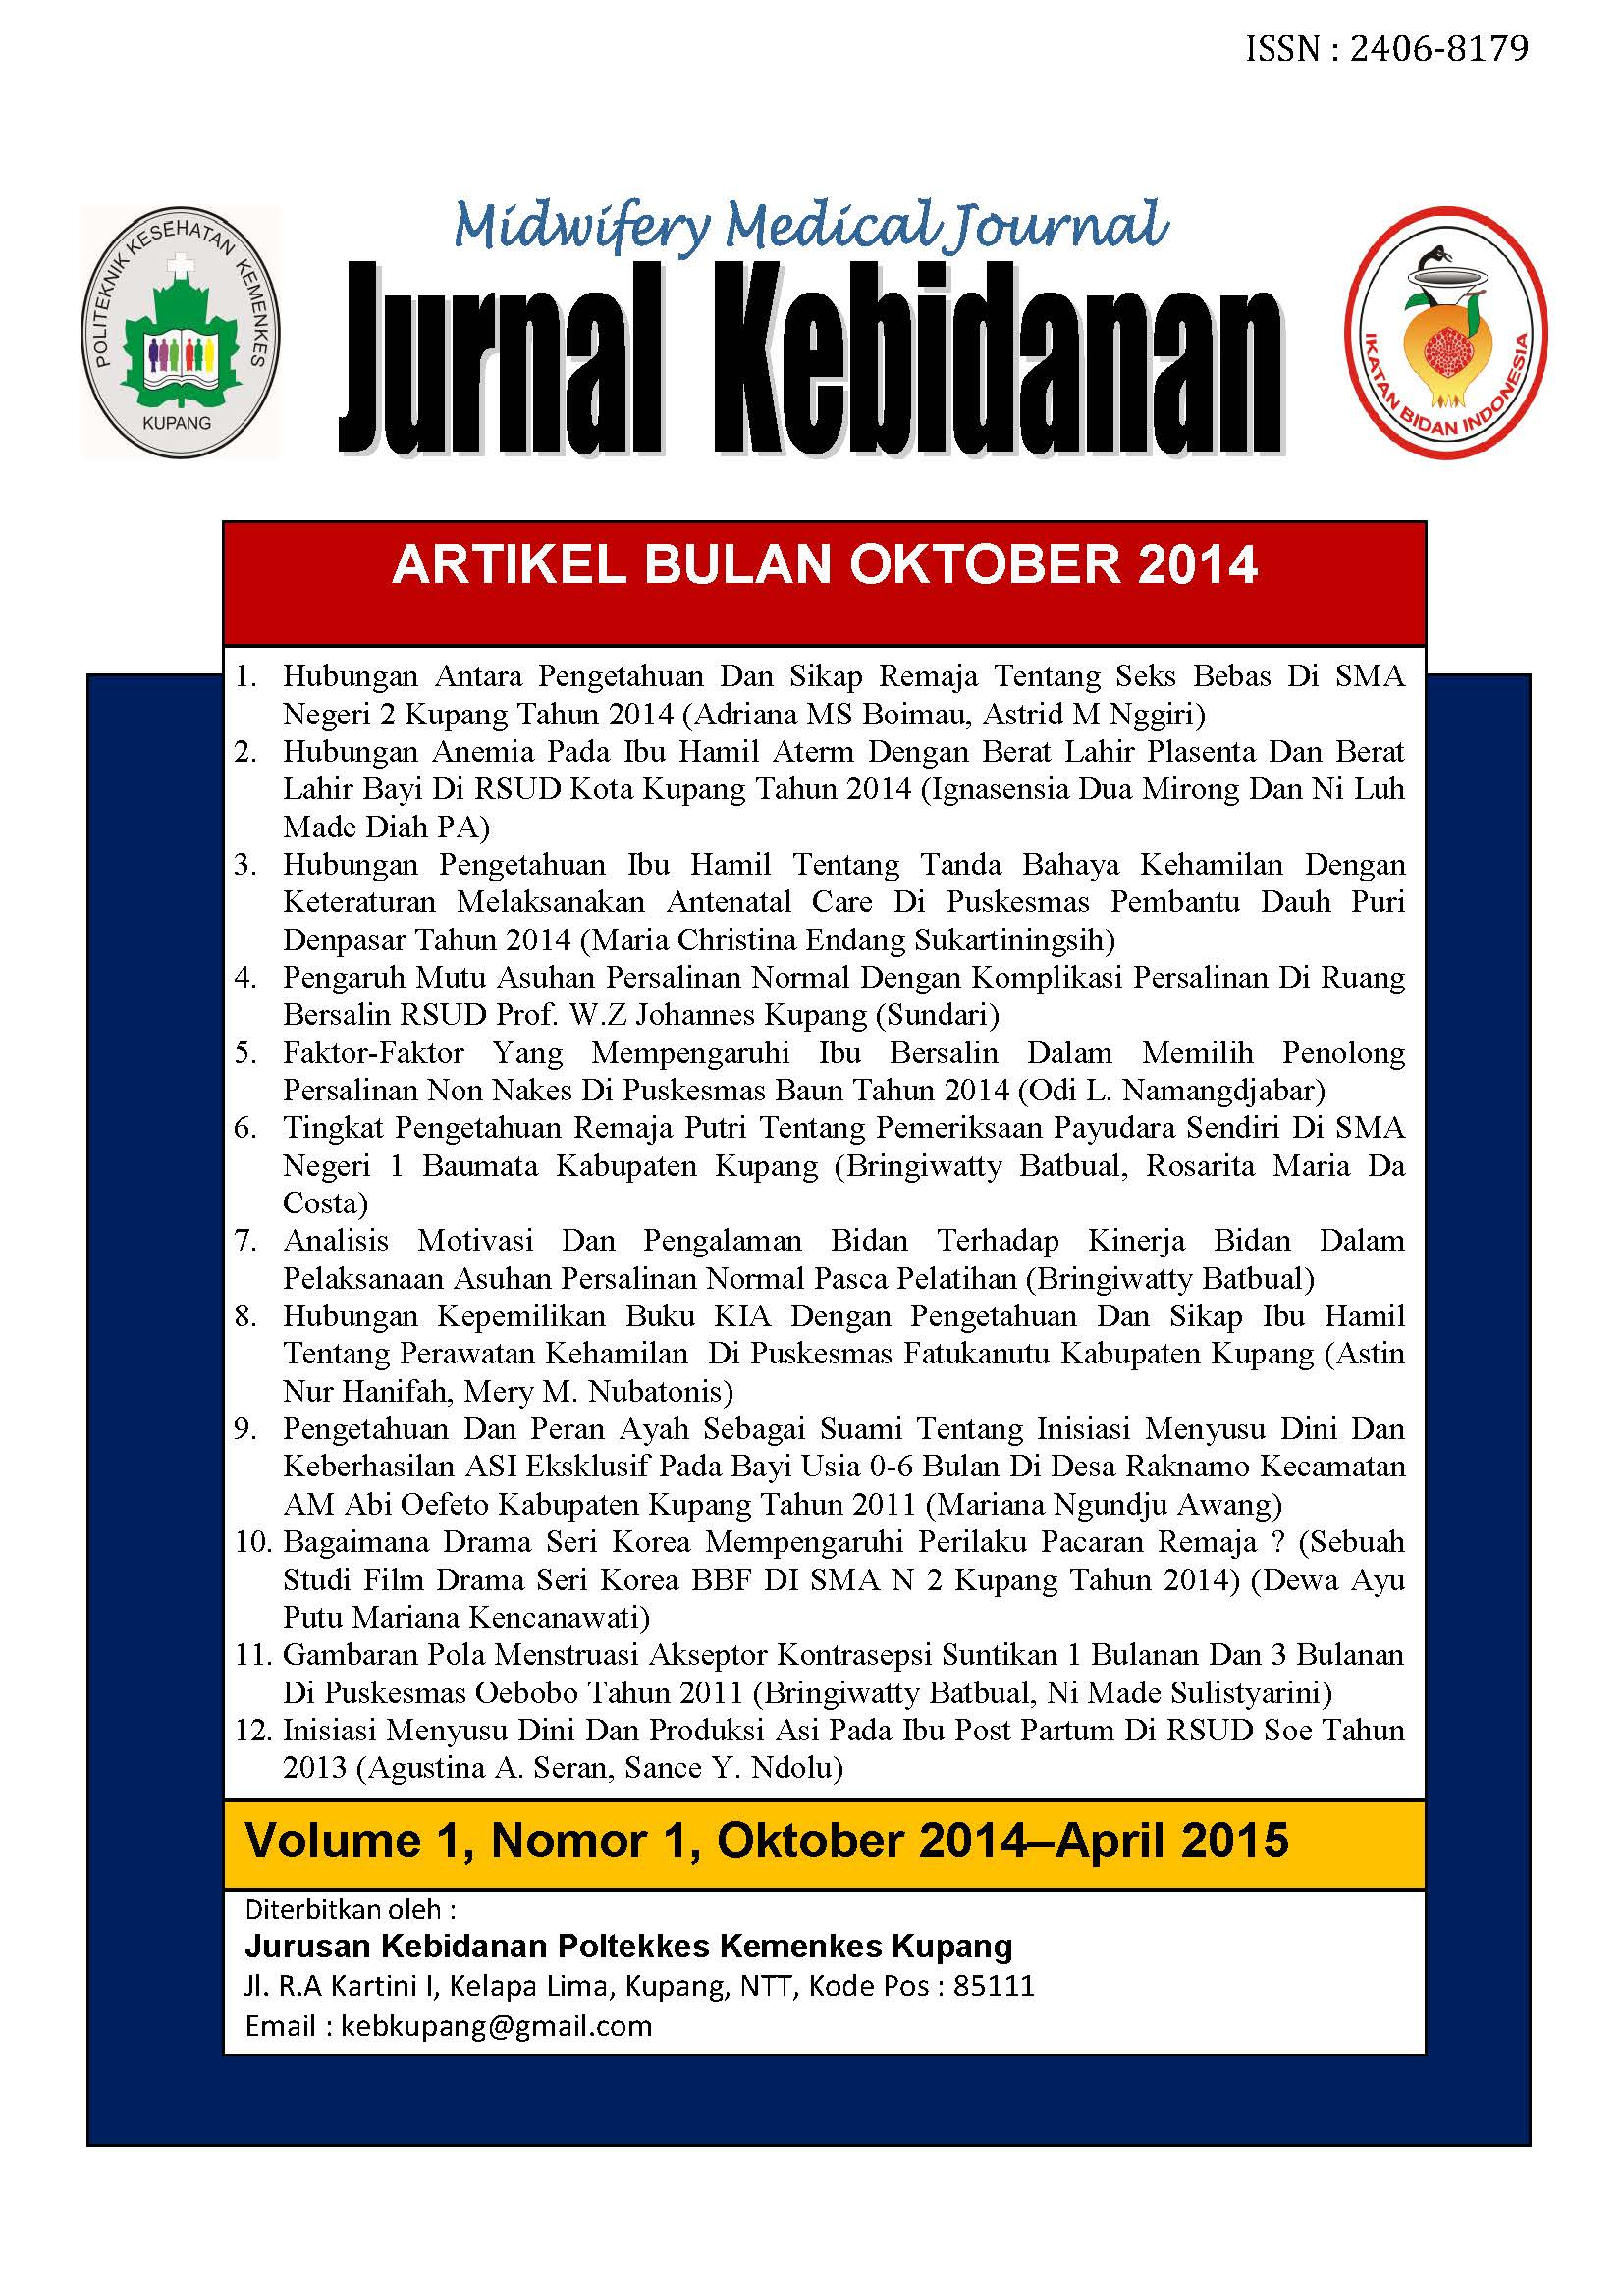 MIDWIFERY MEDICAL JOURNAL